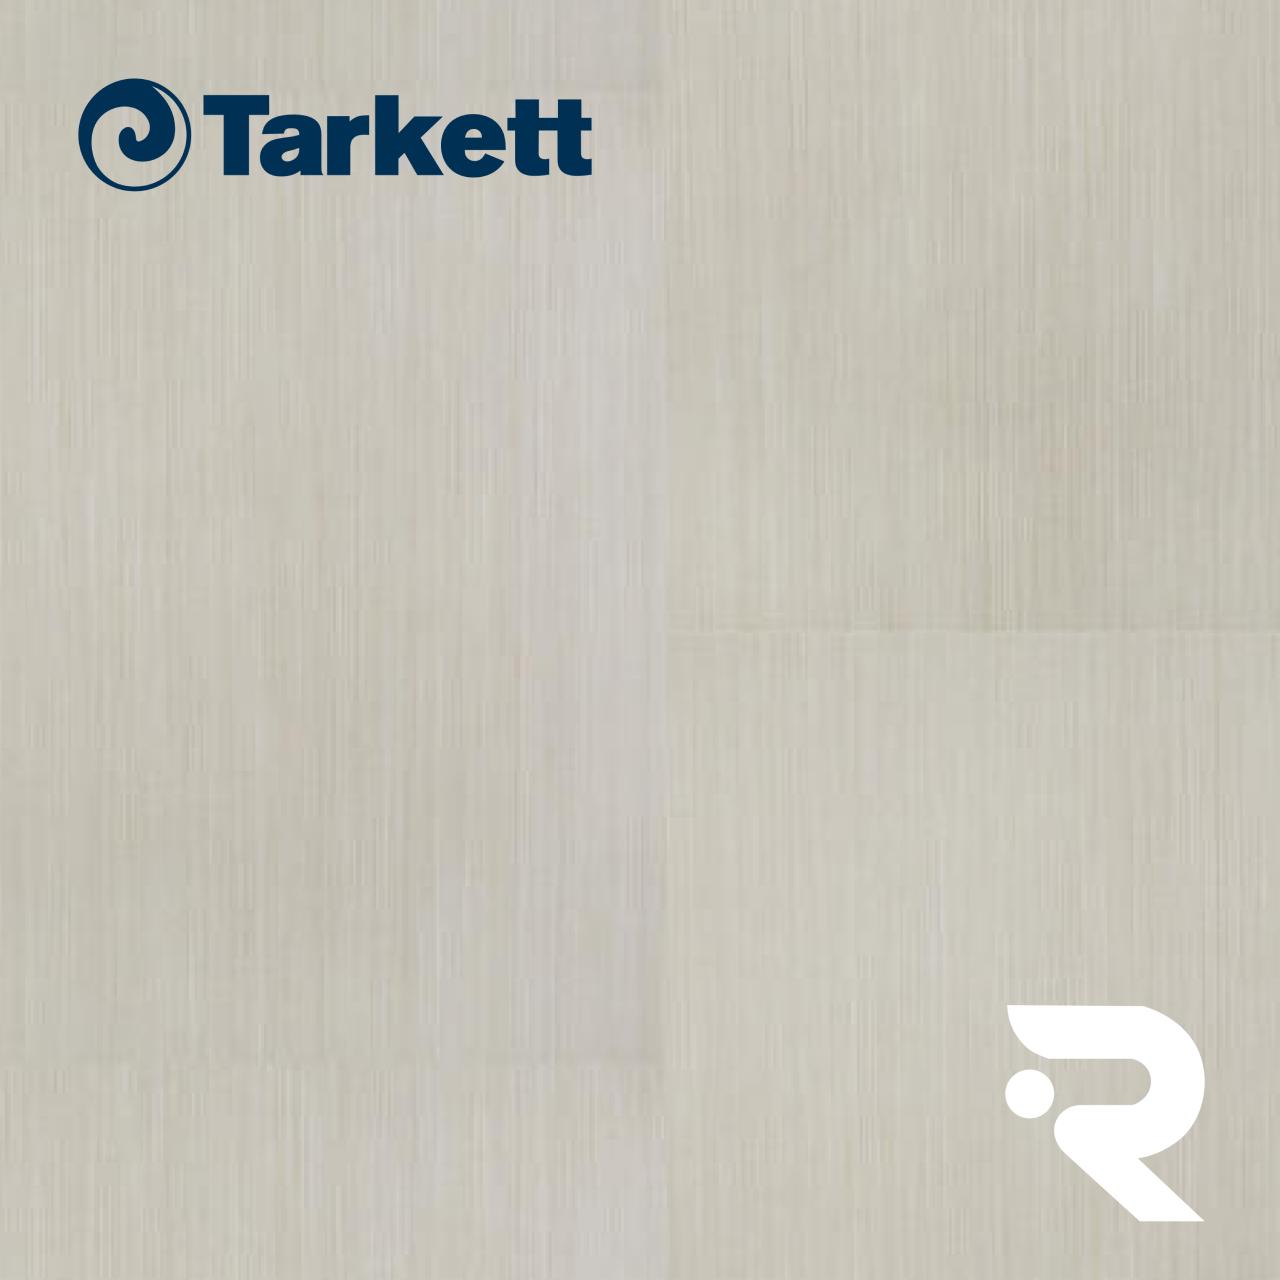 🌳 ПВХ плитка Tarkett   NEW AGE - TEMPUS   Art Vinyl   457 x 457 мм